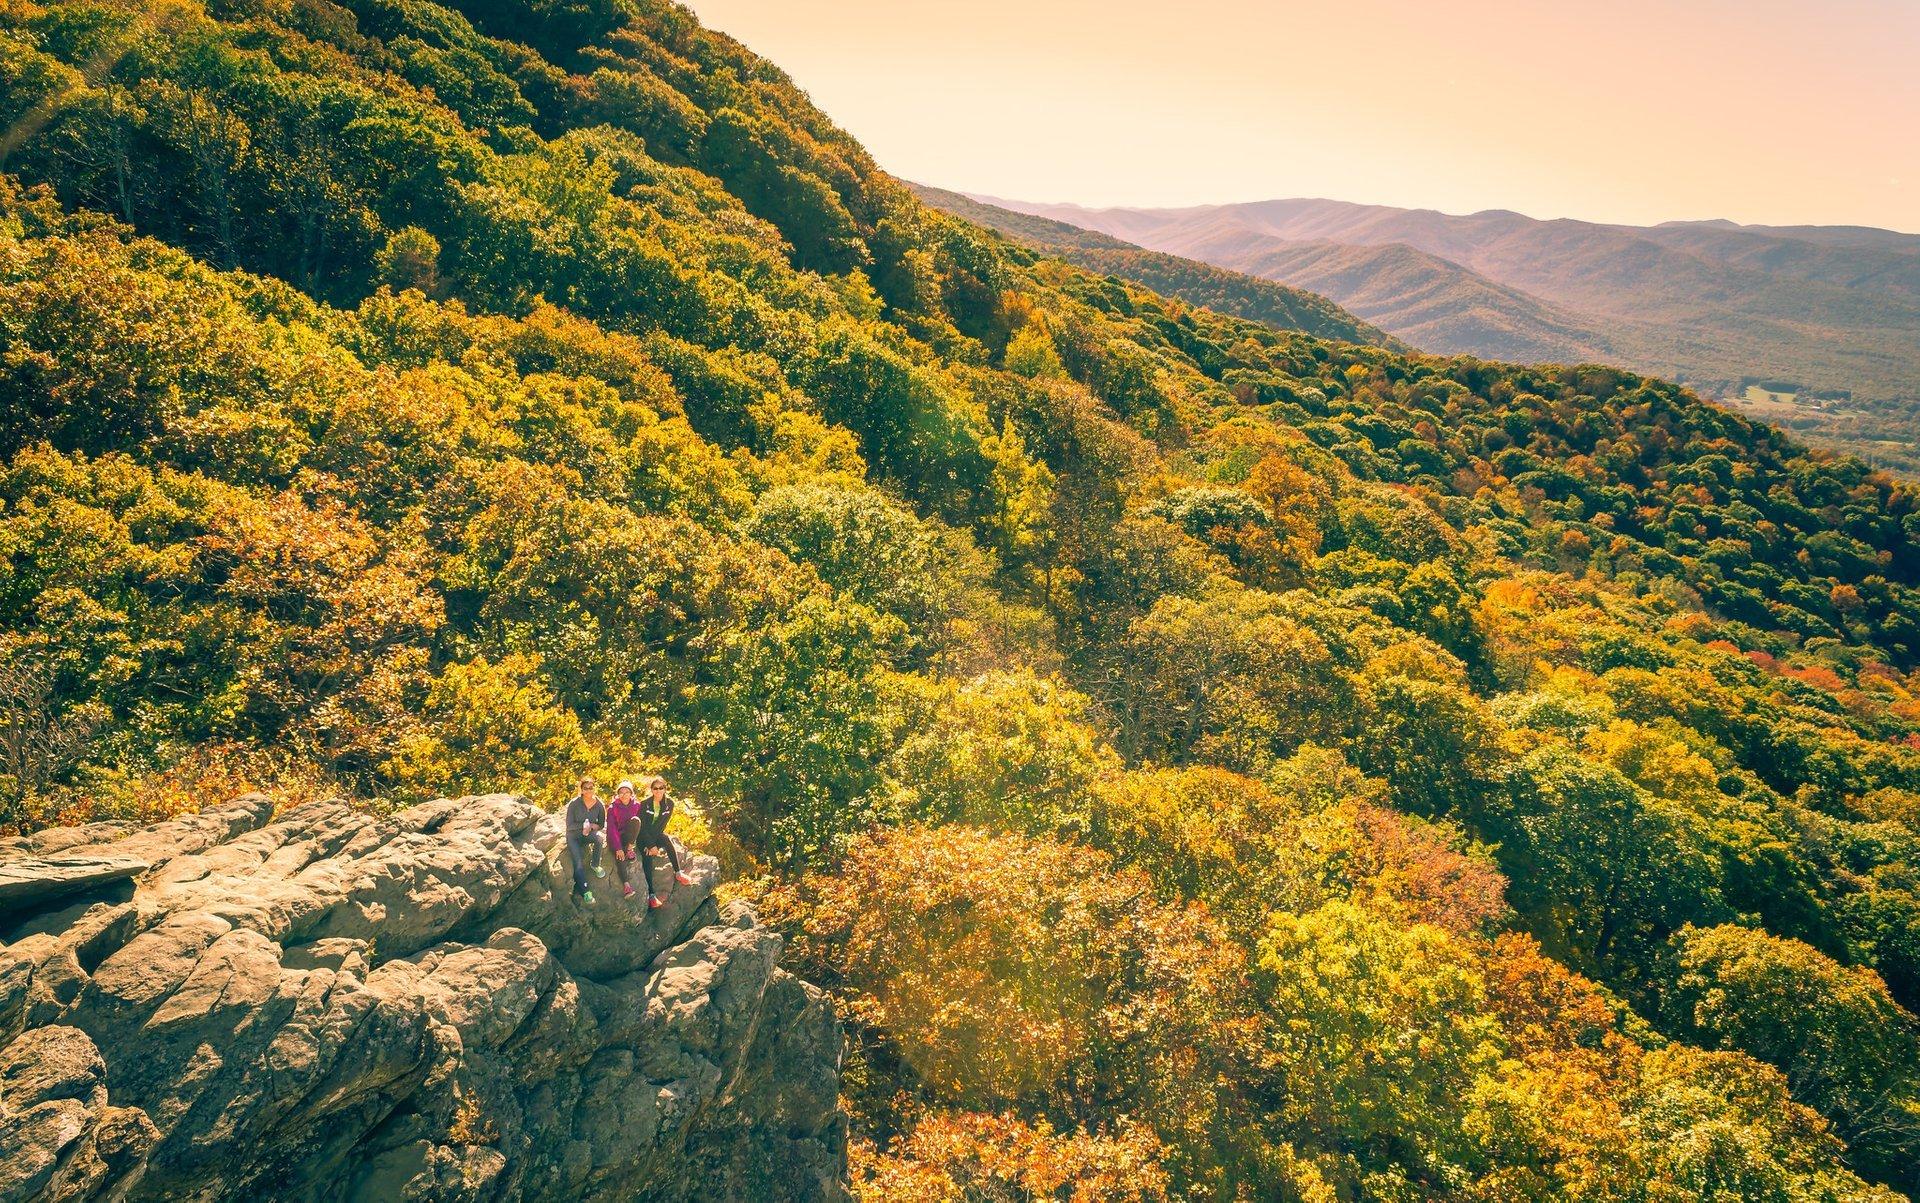 Humpback Rocks, Blue Ridge Parkway 2020